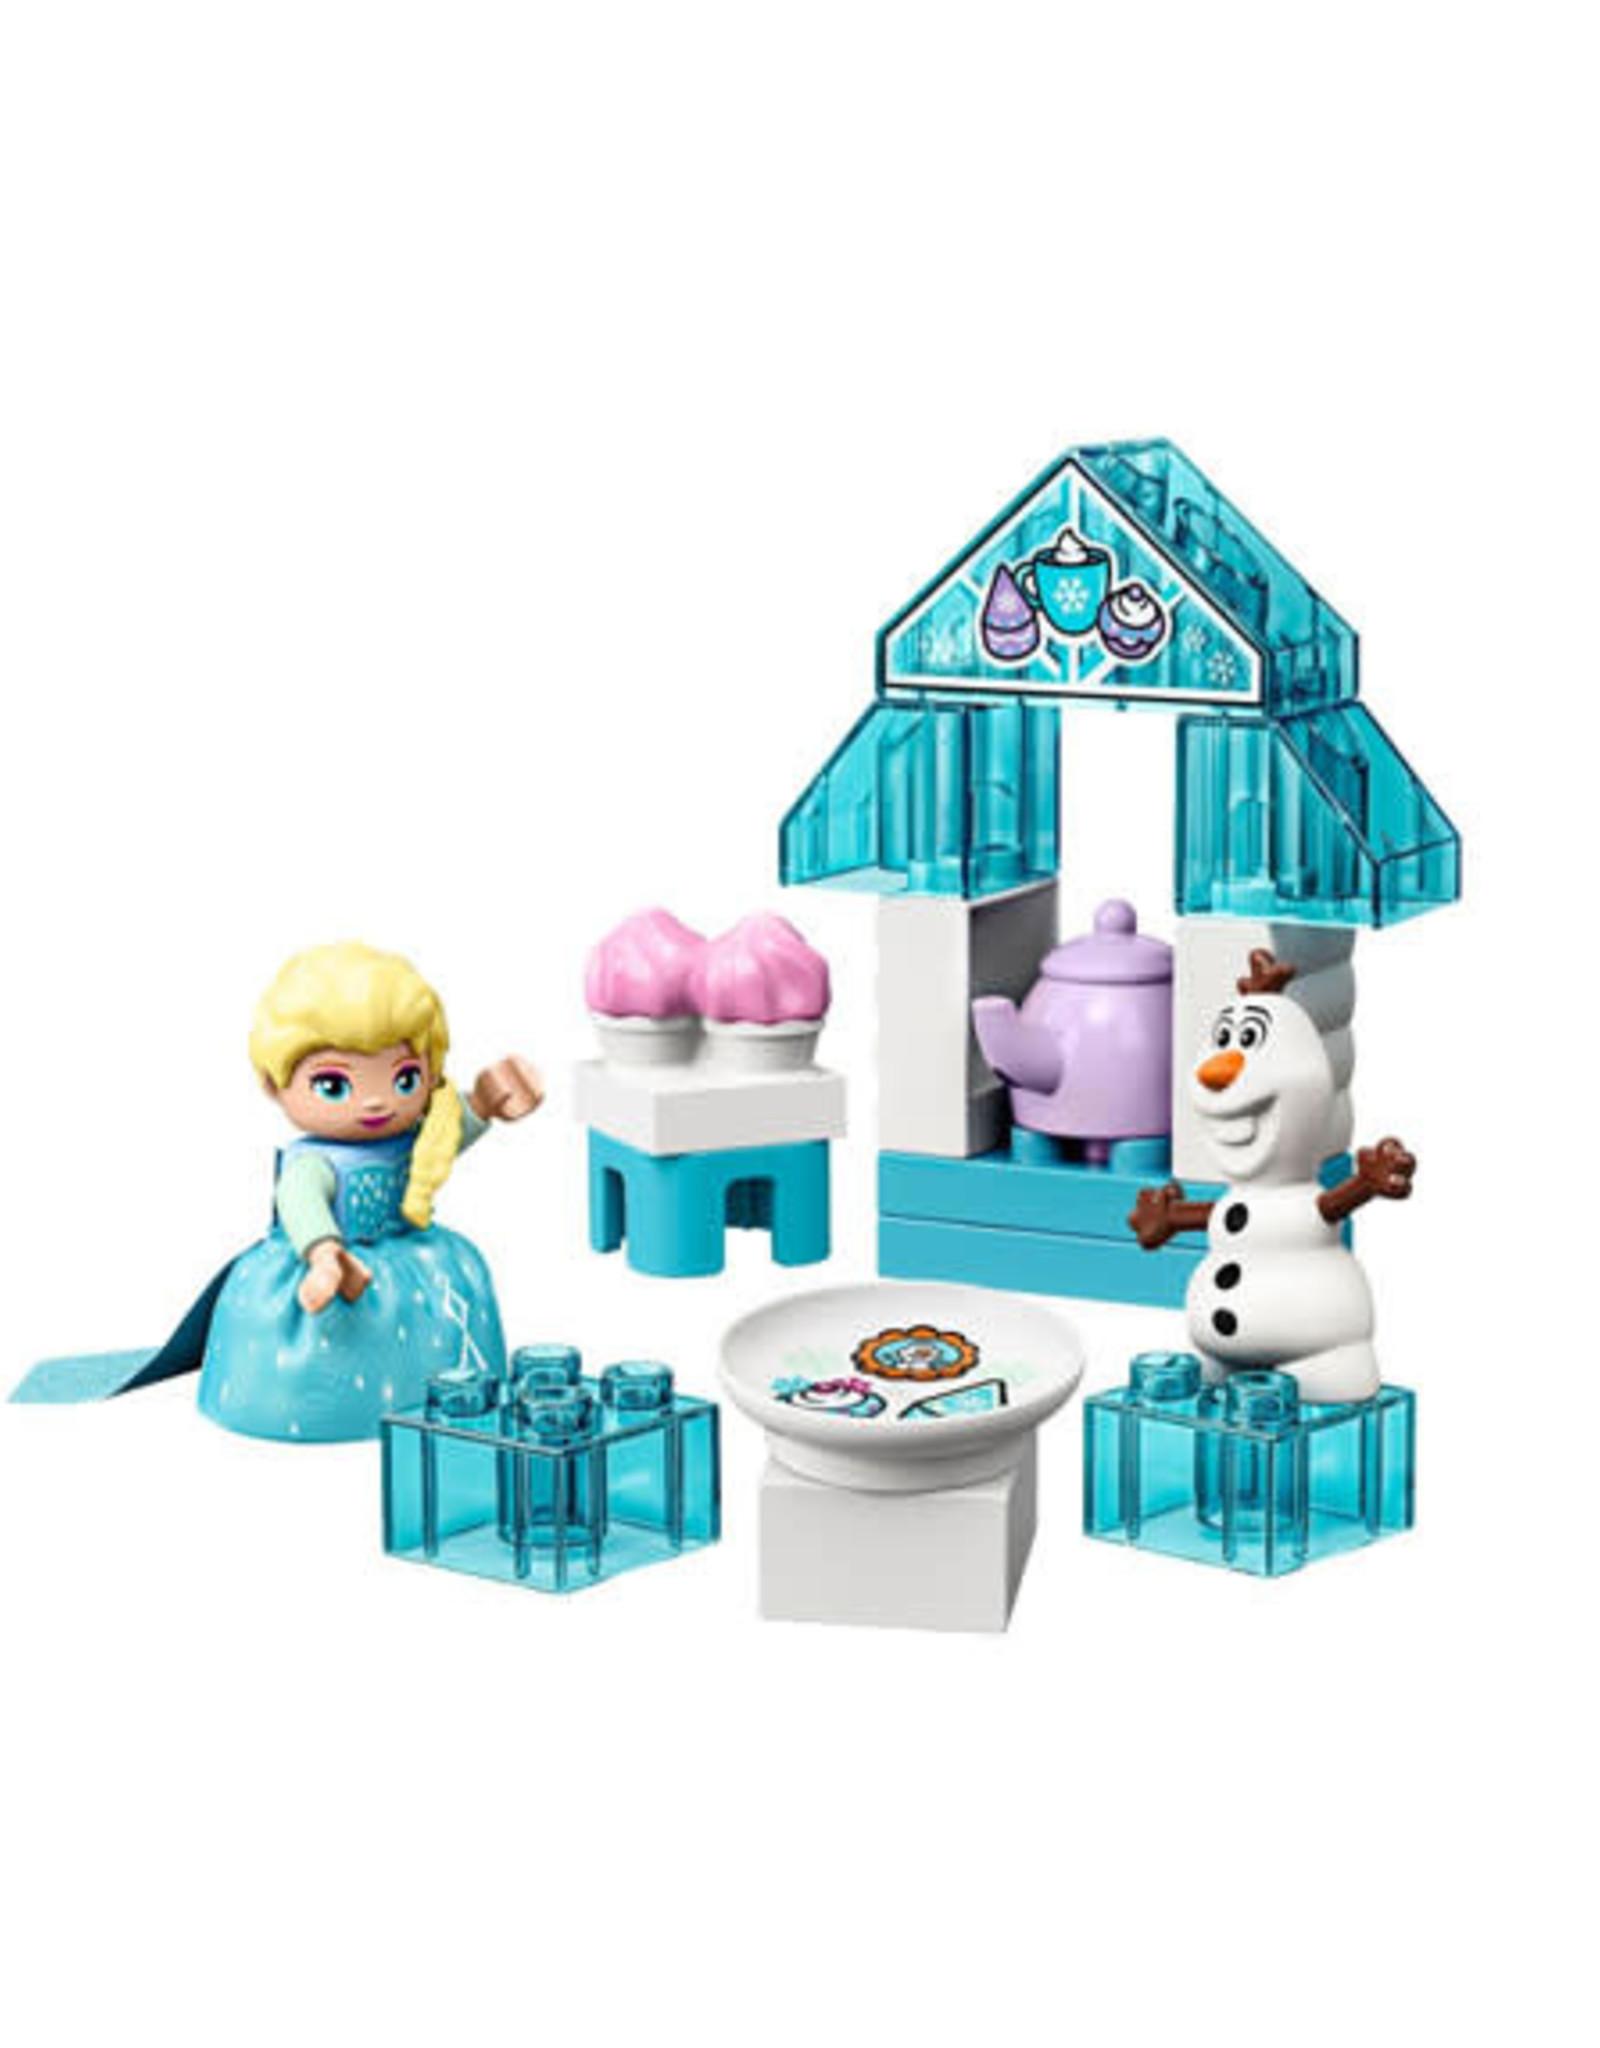 LEGO LEGO 10920 Princess Elsa en Olaf IJsfeest DUPLO NIEUW